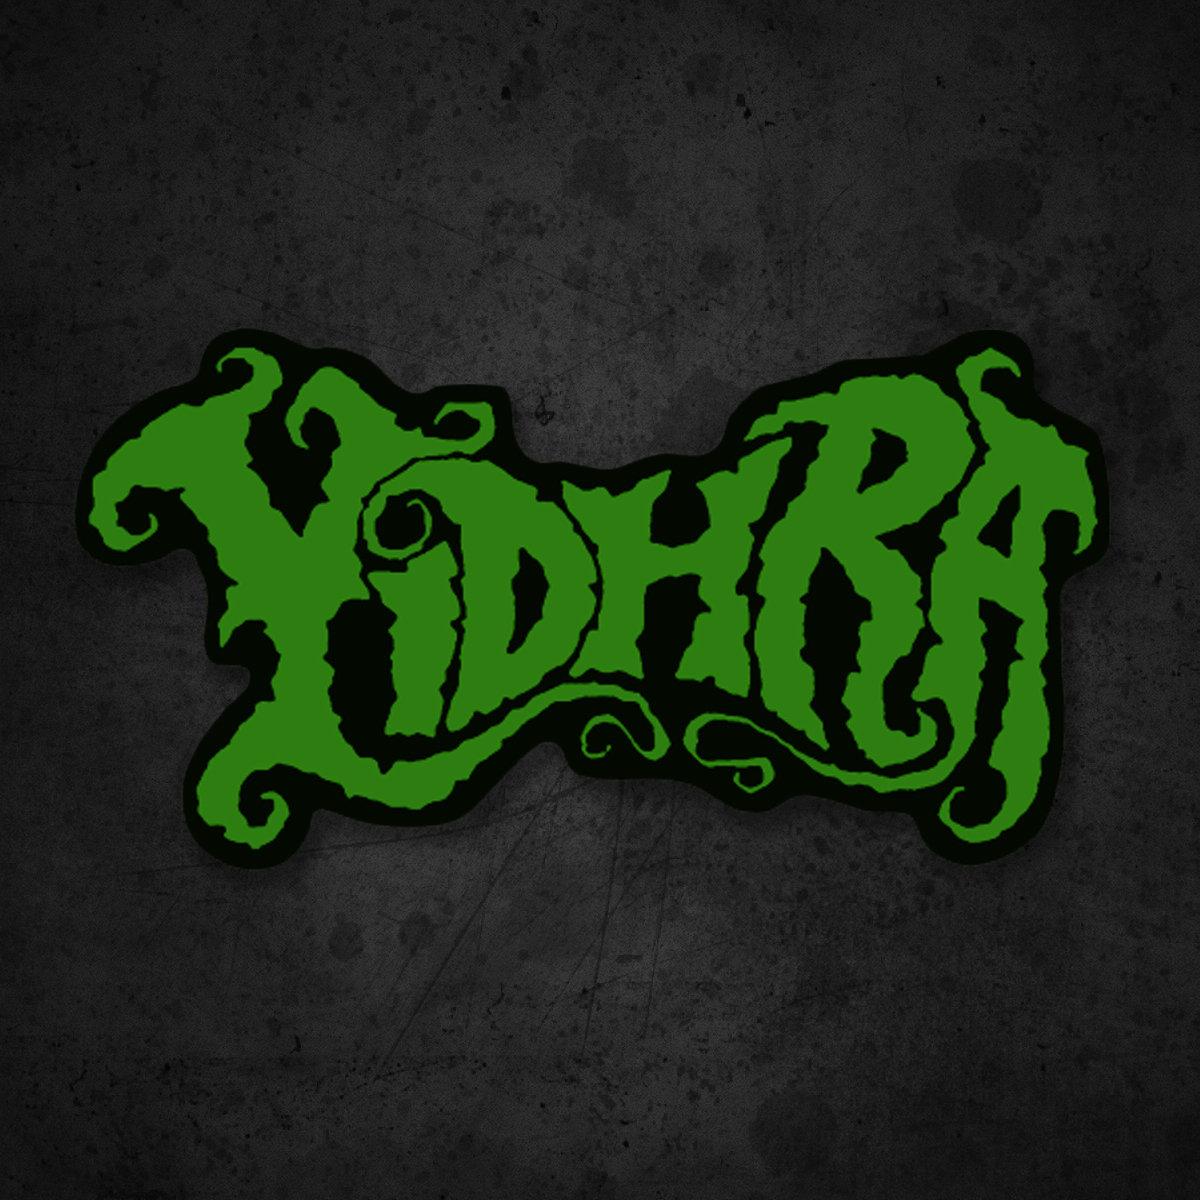 Yidhra Logo DieCut Vinyl Sticker Yidhra - Die cut vinyl stickers